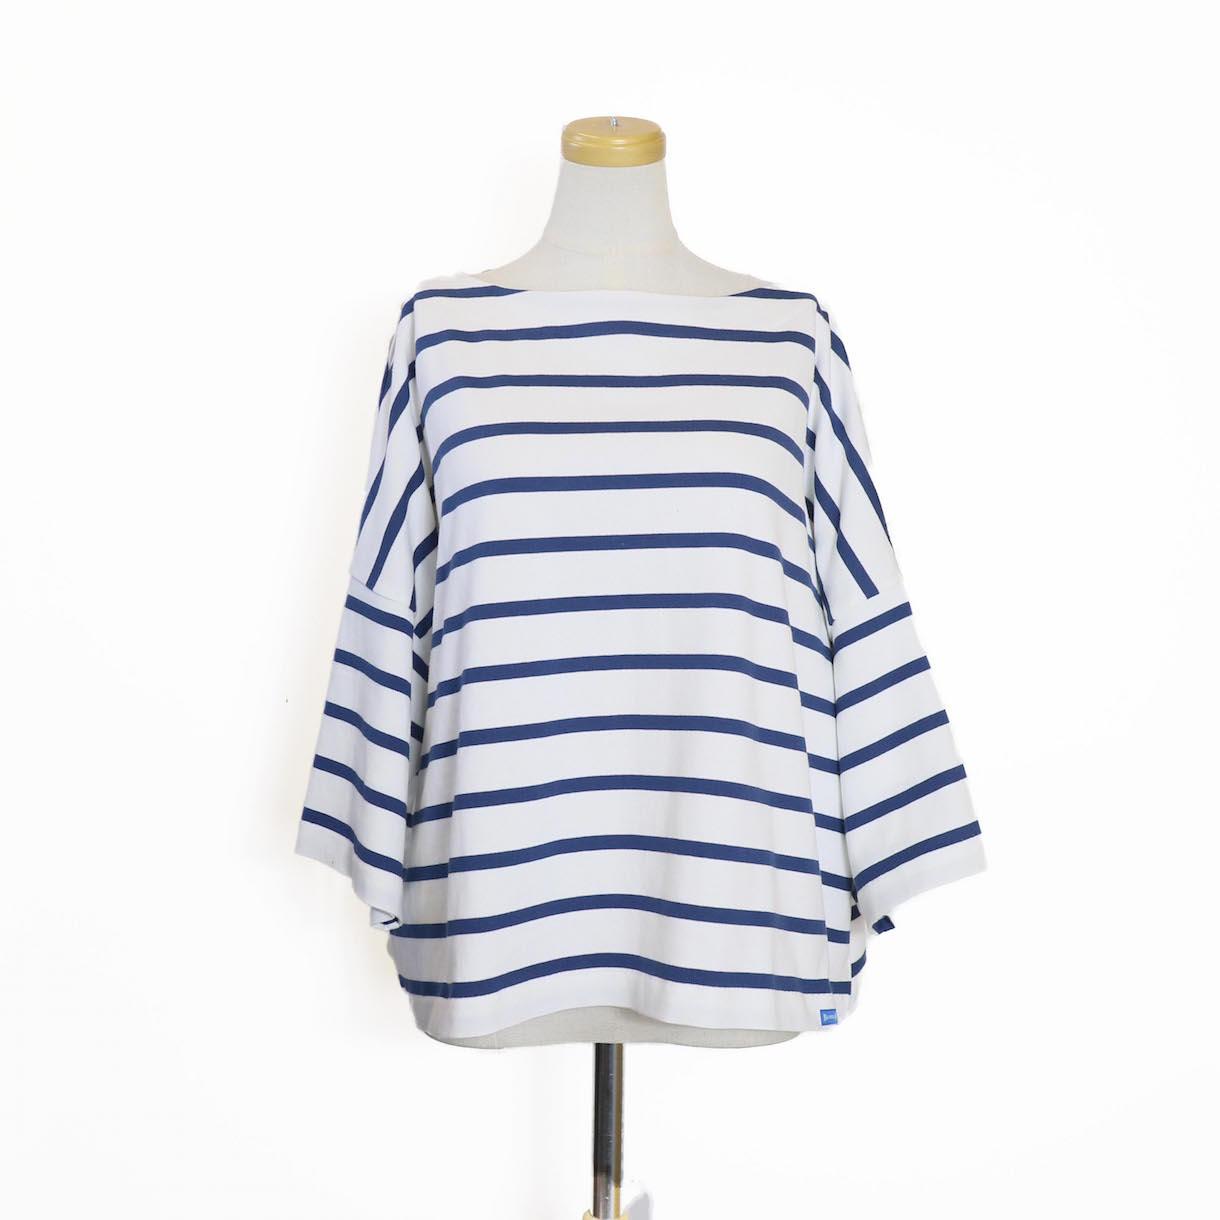 BLUEBIRD BOULEVARD / ボーダーバスクシャツ(半袖)-BLACK